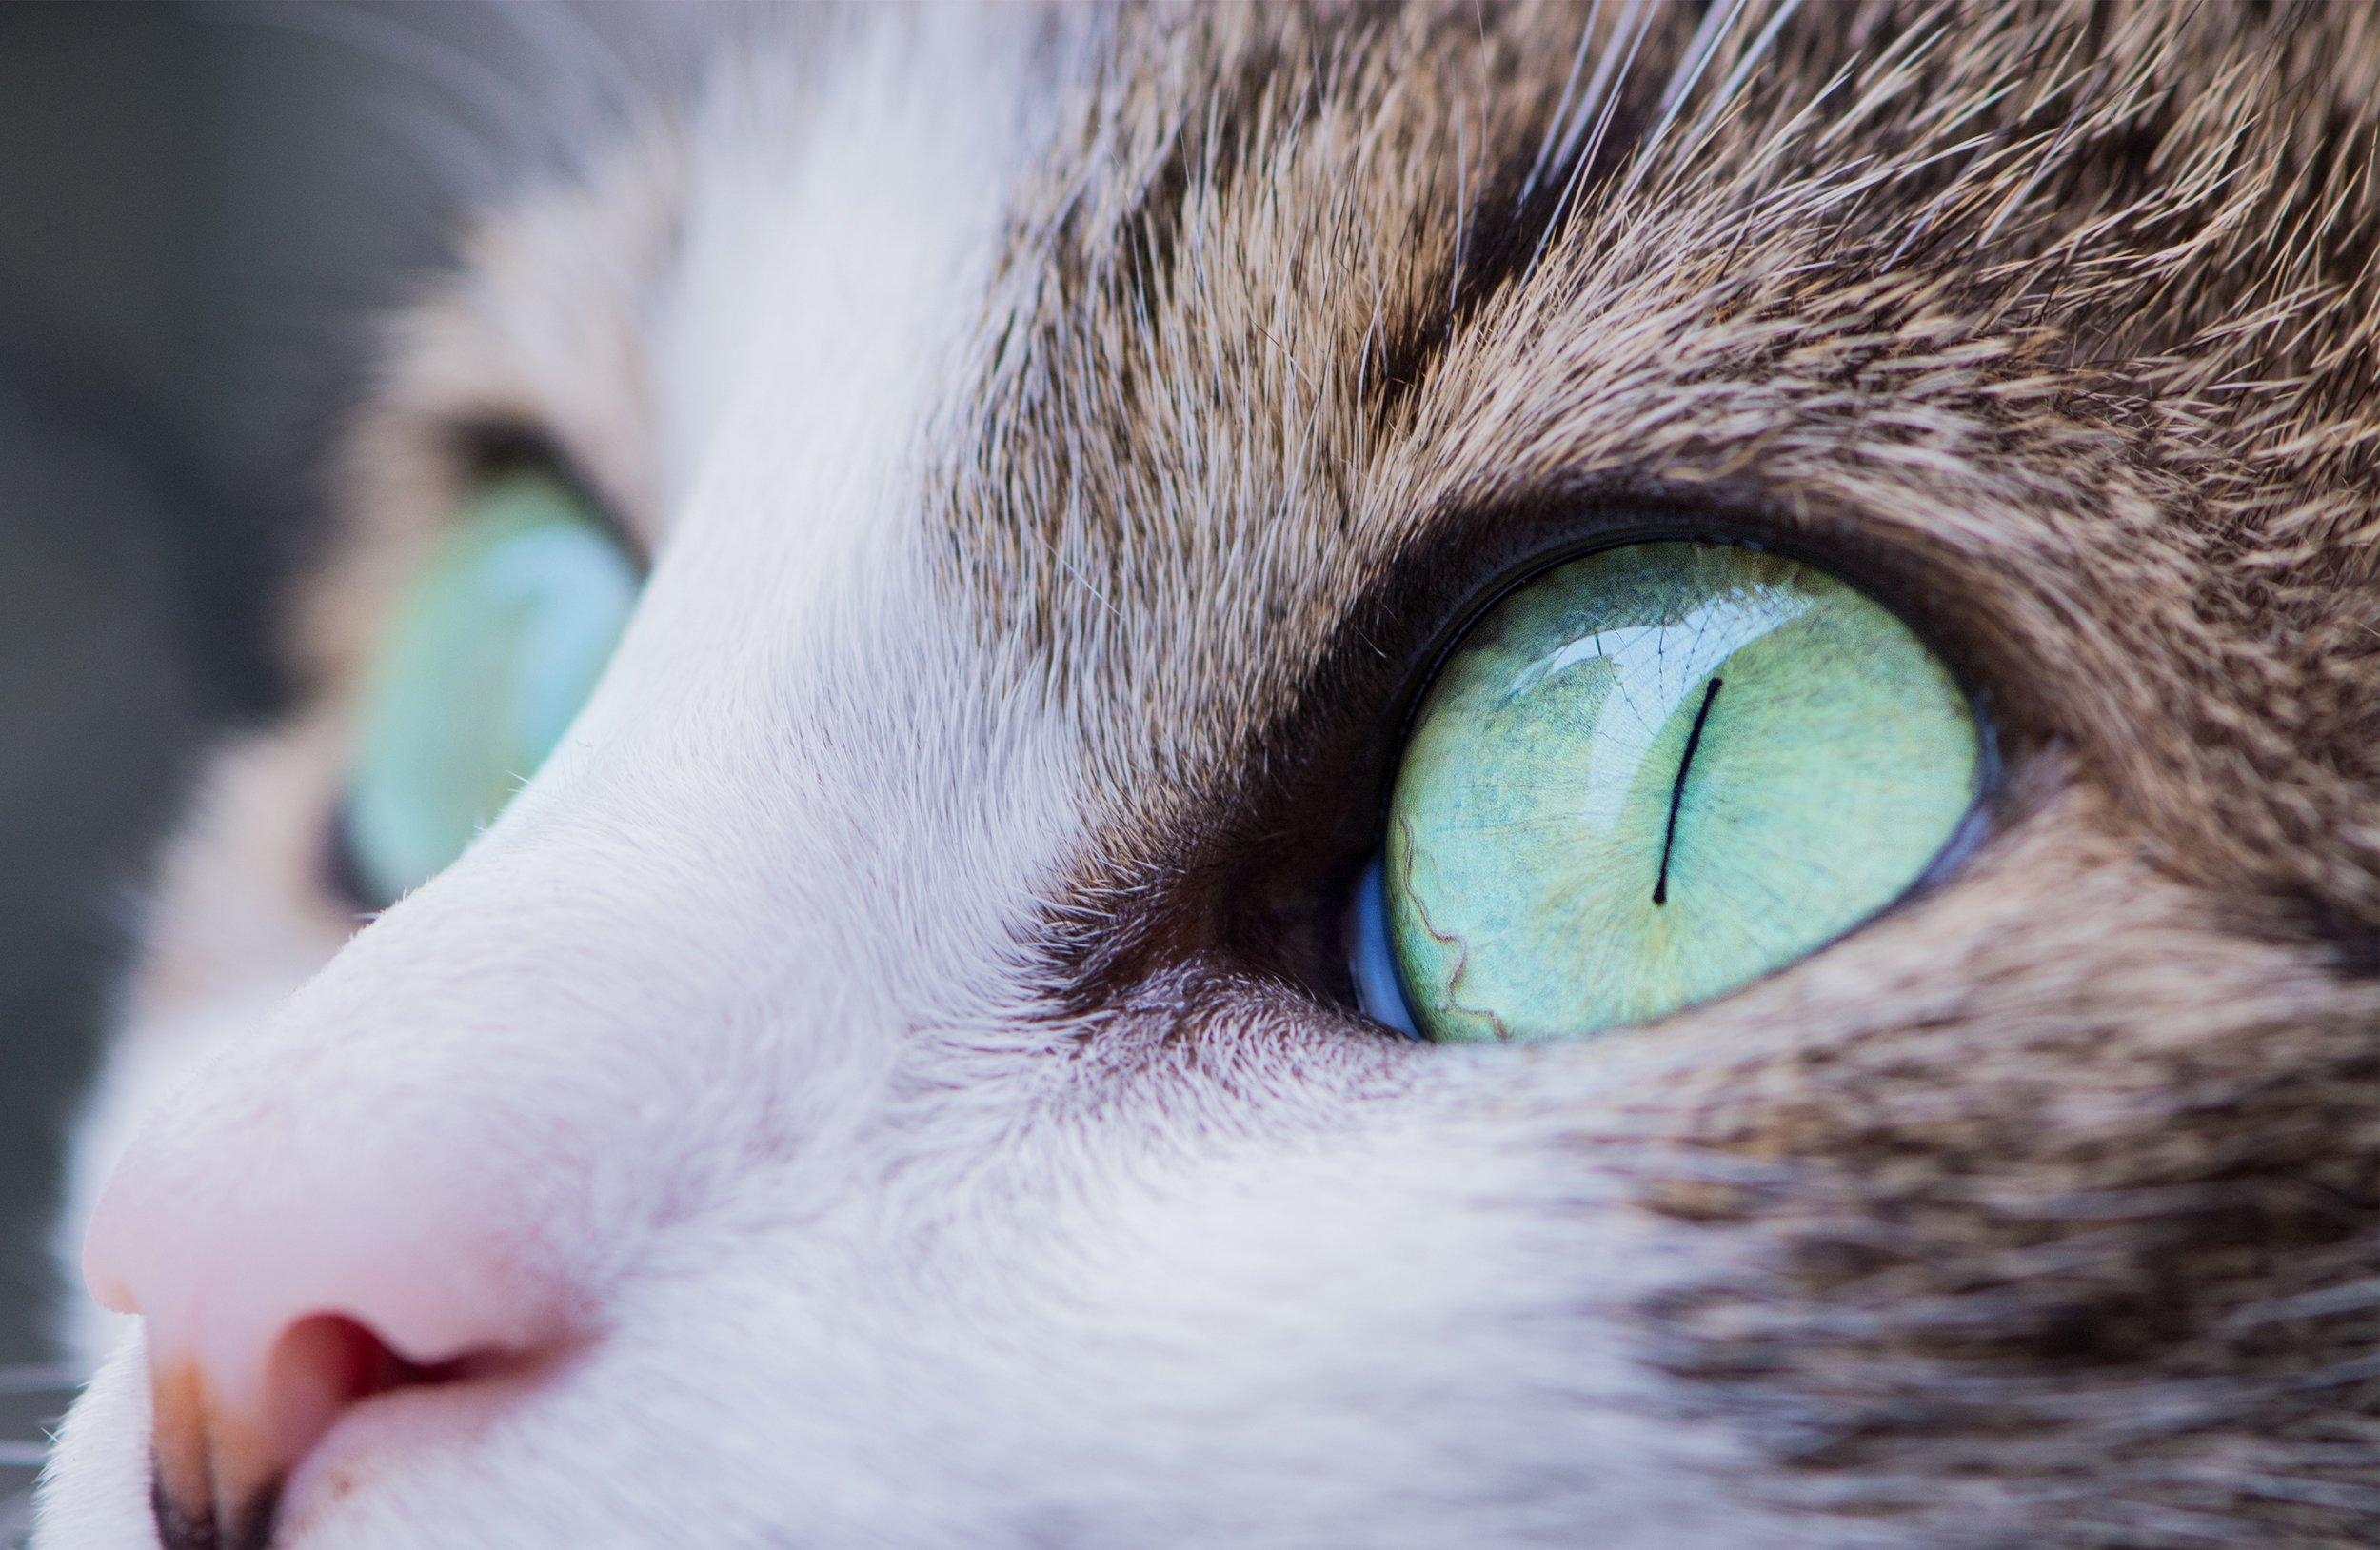 cat eyes #cateyes #burmesecats